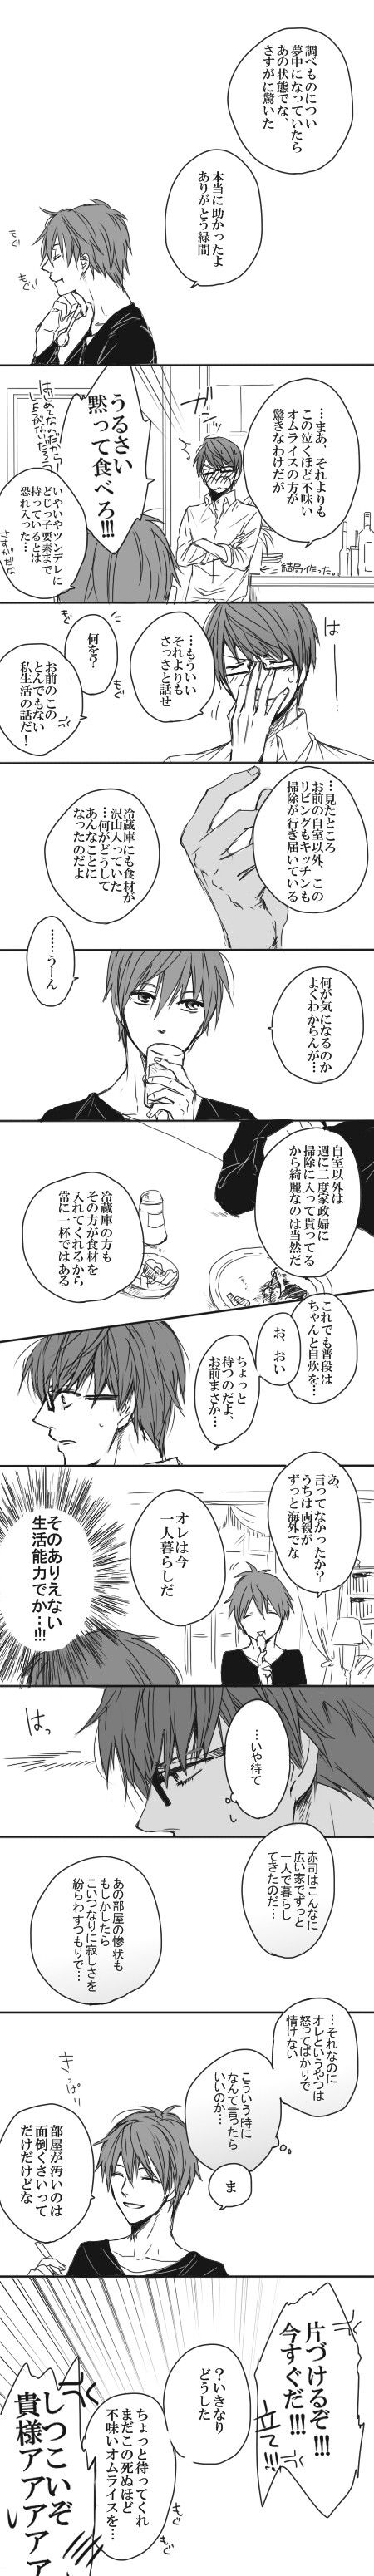 Midorima Shintarō x Akashi Seijūrō 緑間 真太郎 X 赤司征十郎 【綠赤】あまり進展のない赤司君のはなしその2